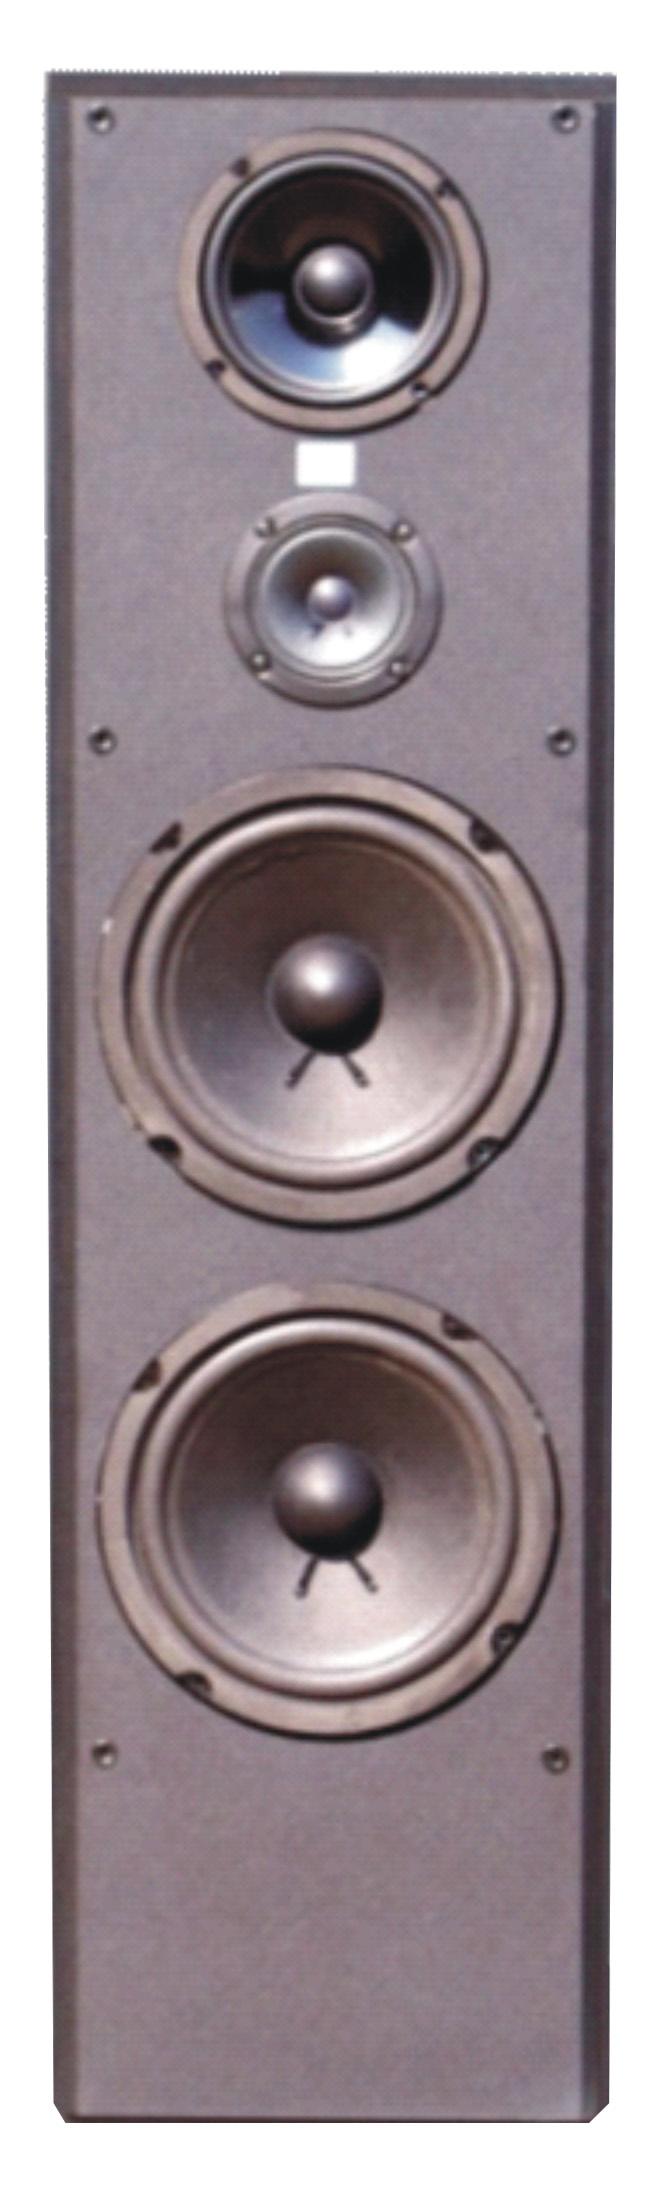 Loa nghe nhạc VE-VN2001